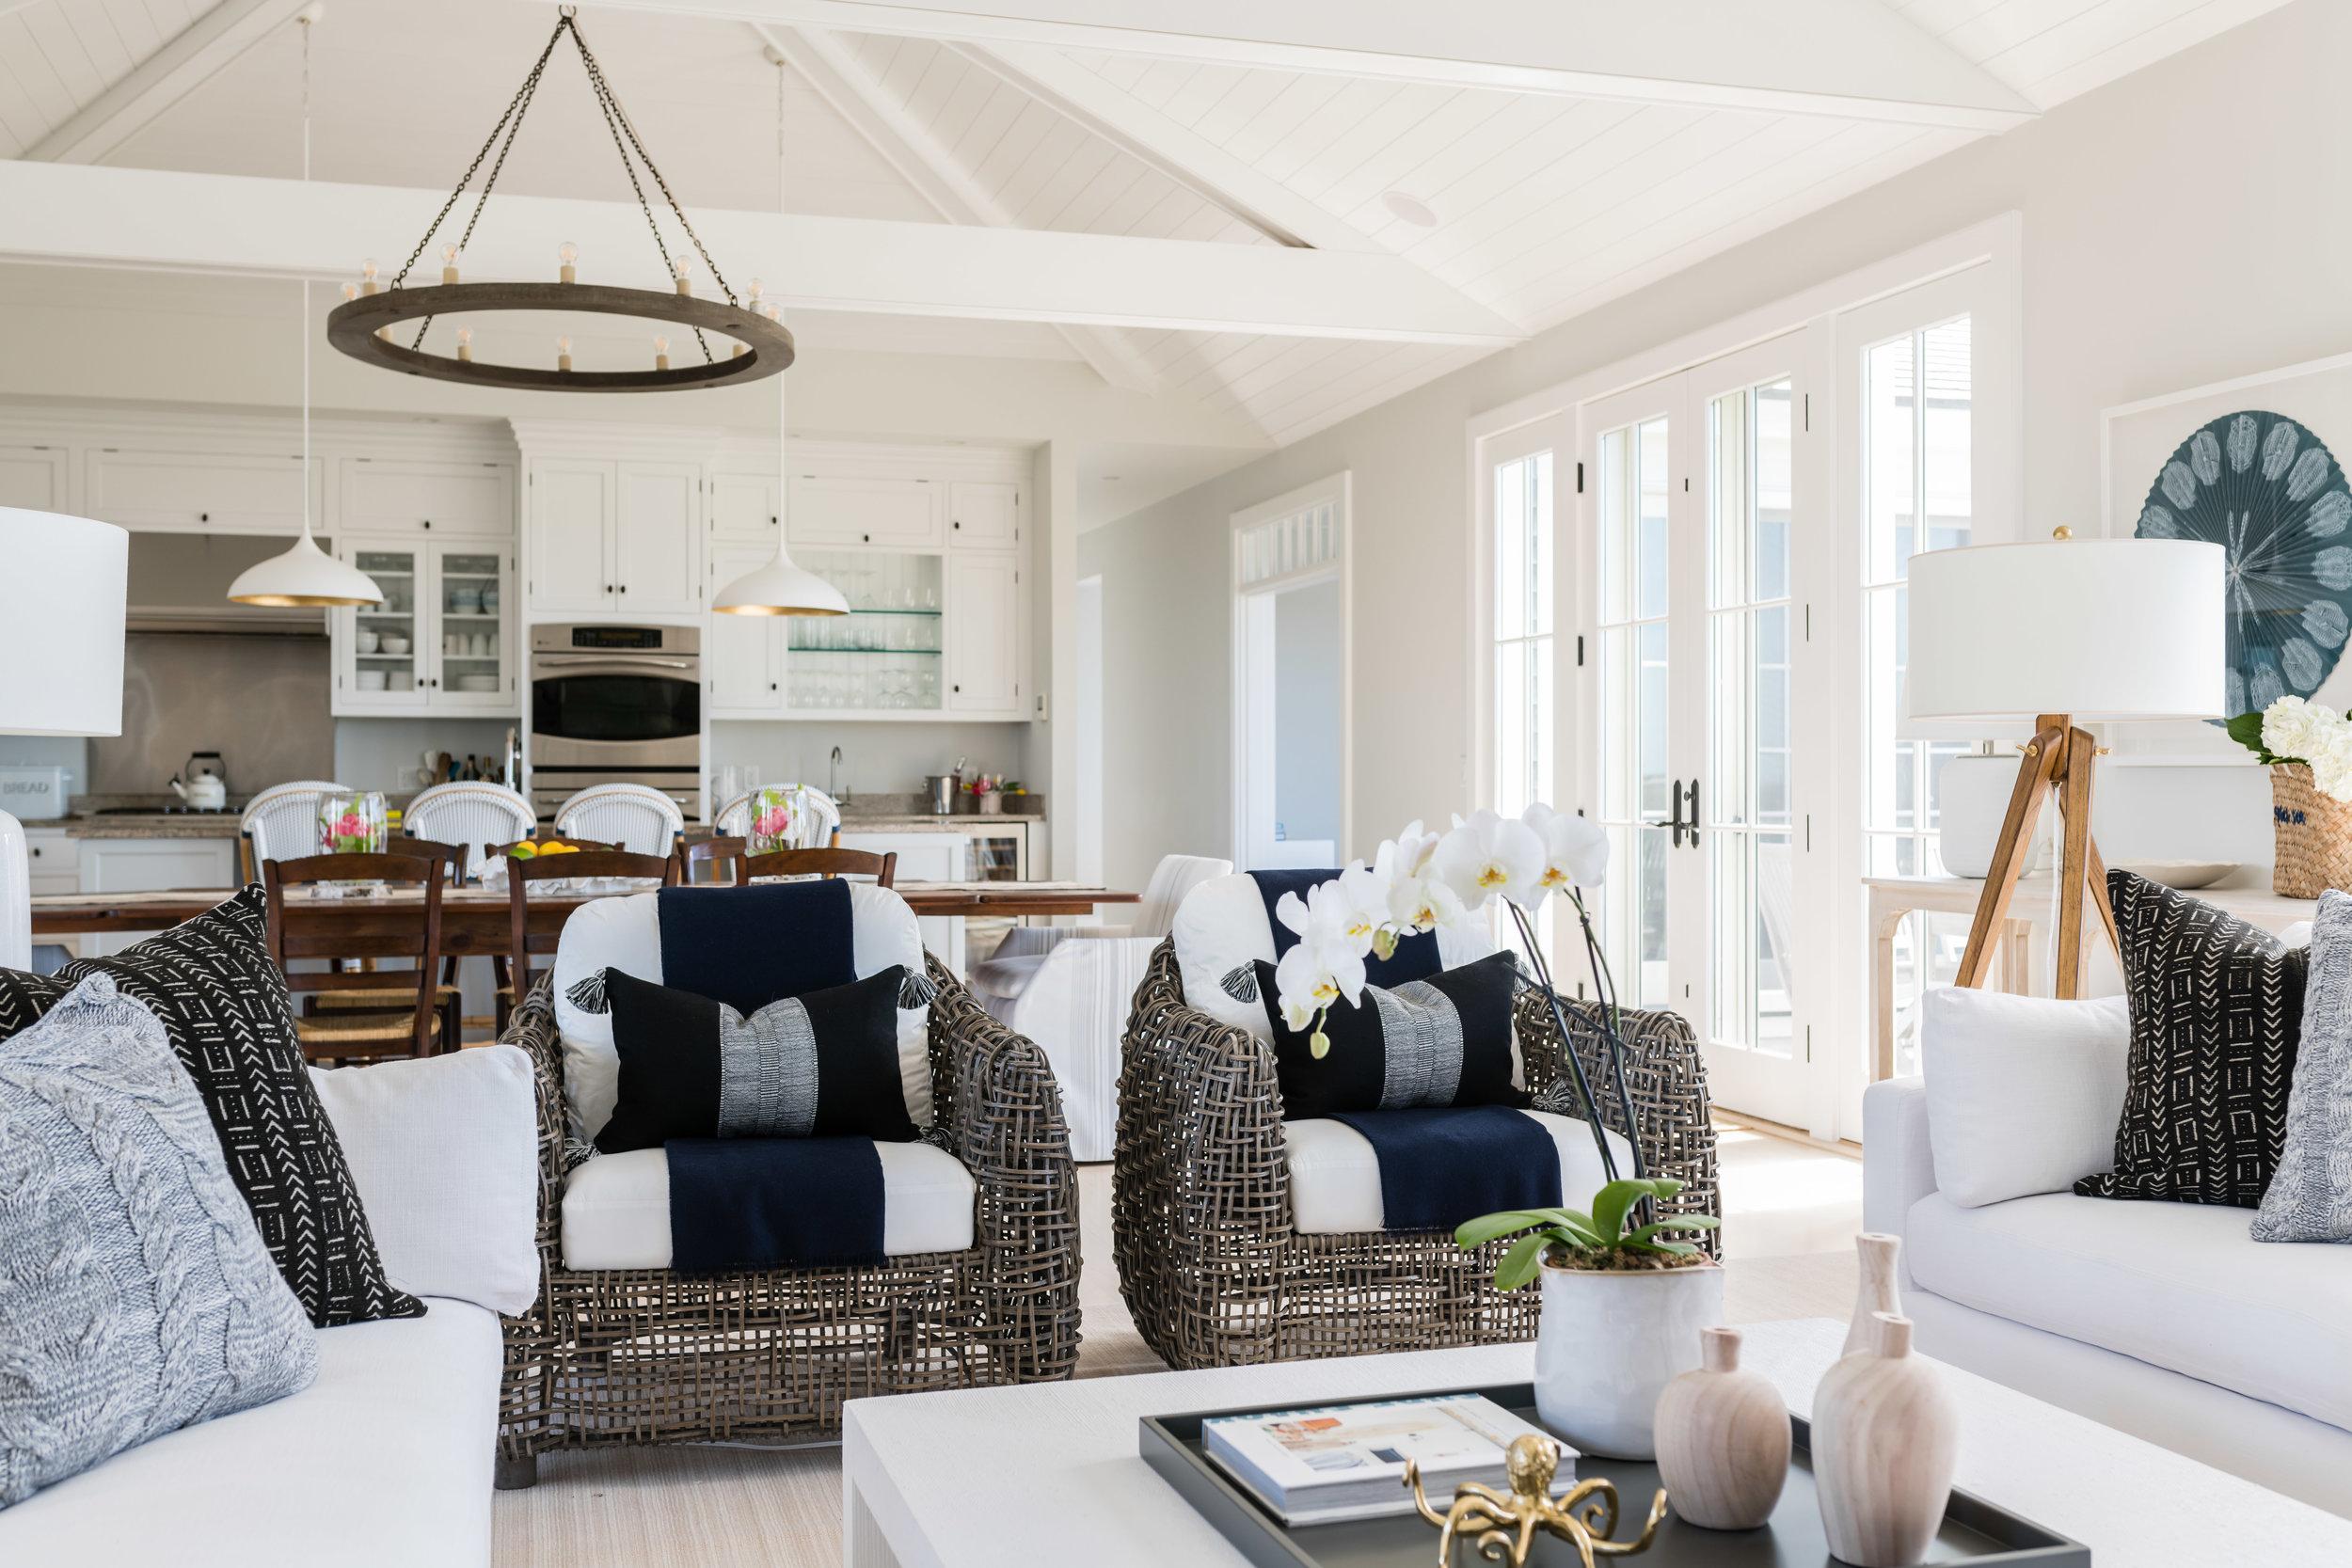 Living room, view to kitchen: chandelier,  Arteriors ; foreground accessories,  Doublemint Home . Design:  James Studio Interiors  // Photo:  Jessica Delaney .